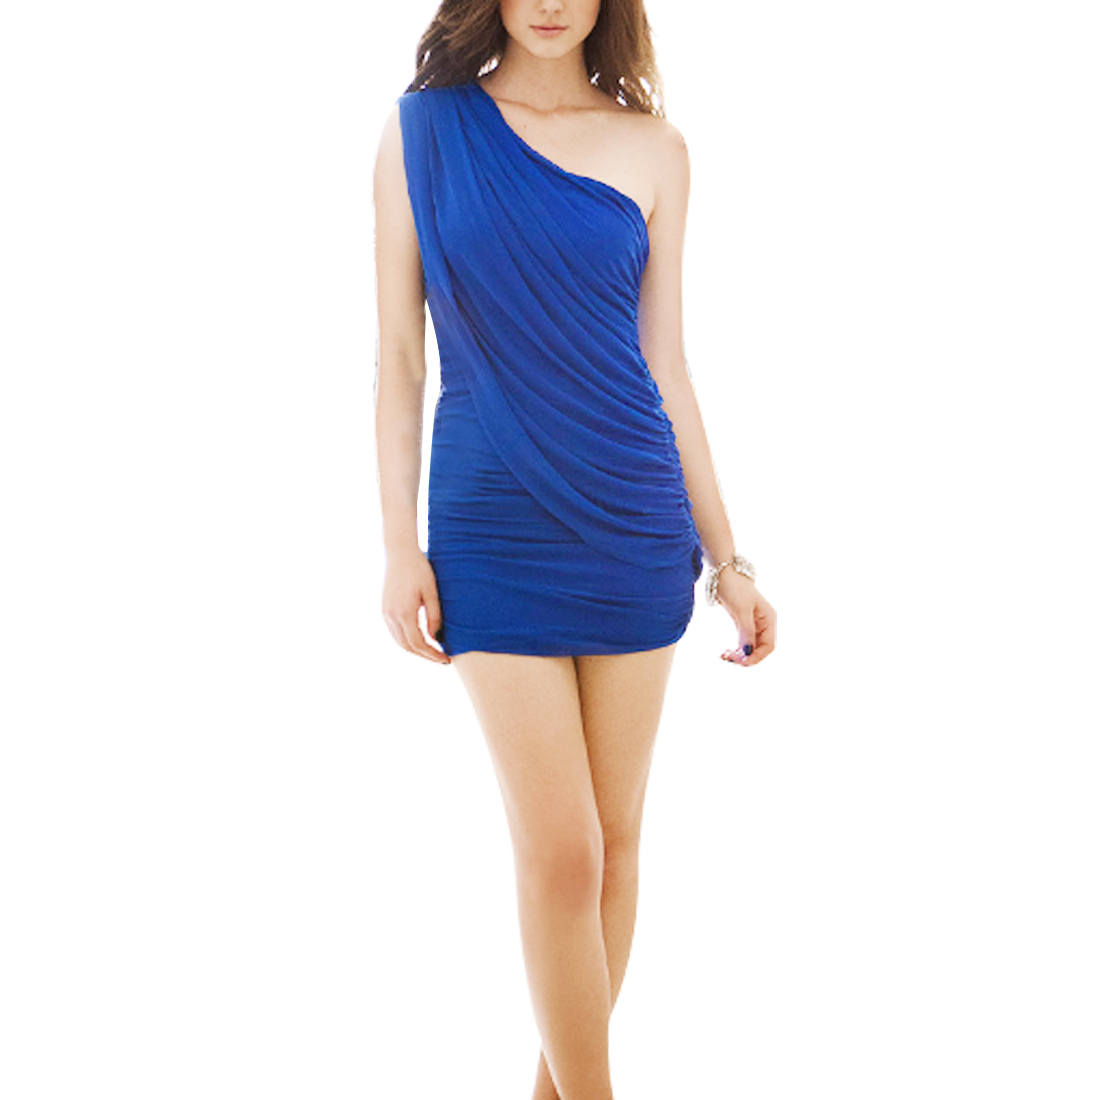 One Shoulder Solid Dark Blue Stylish Mini Dress XS for Ladies